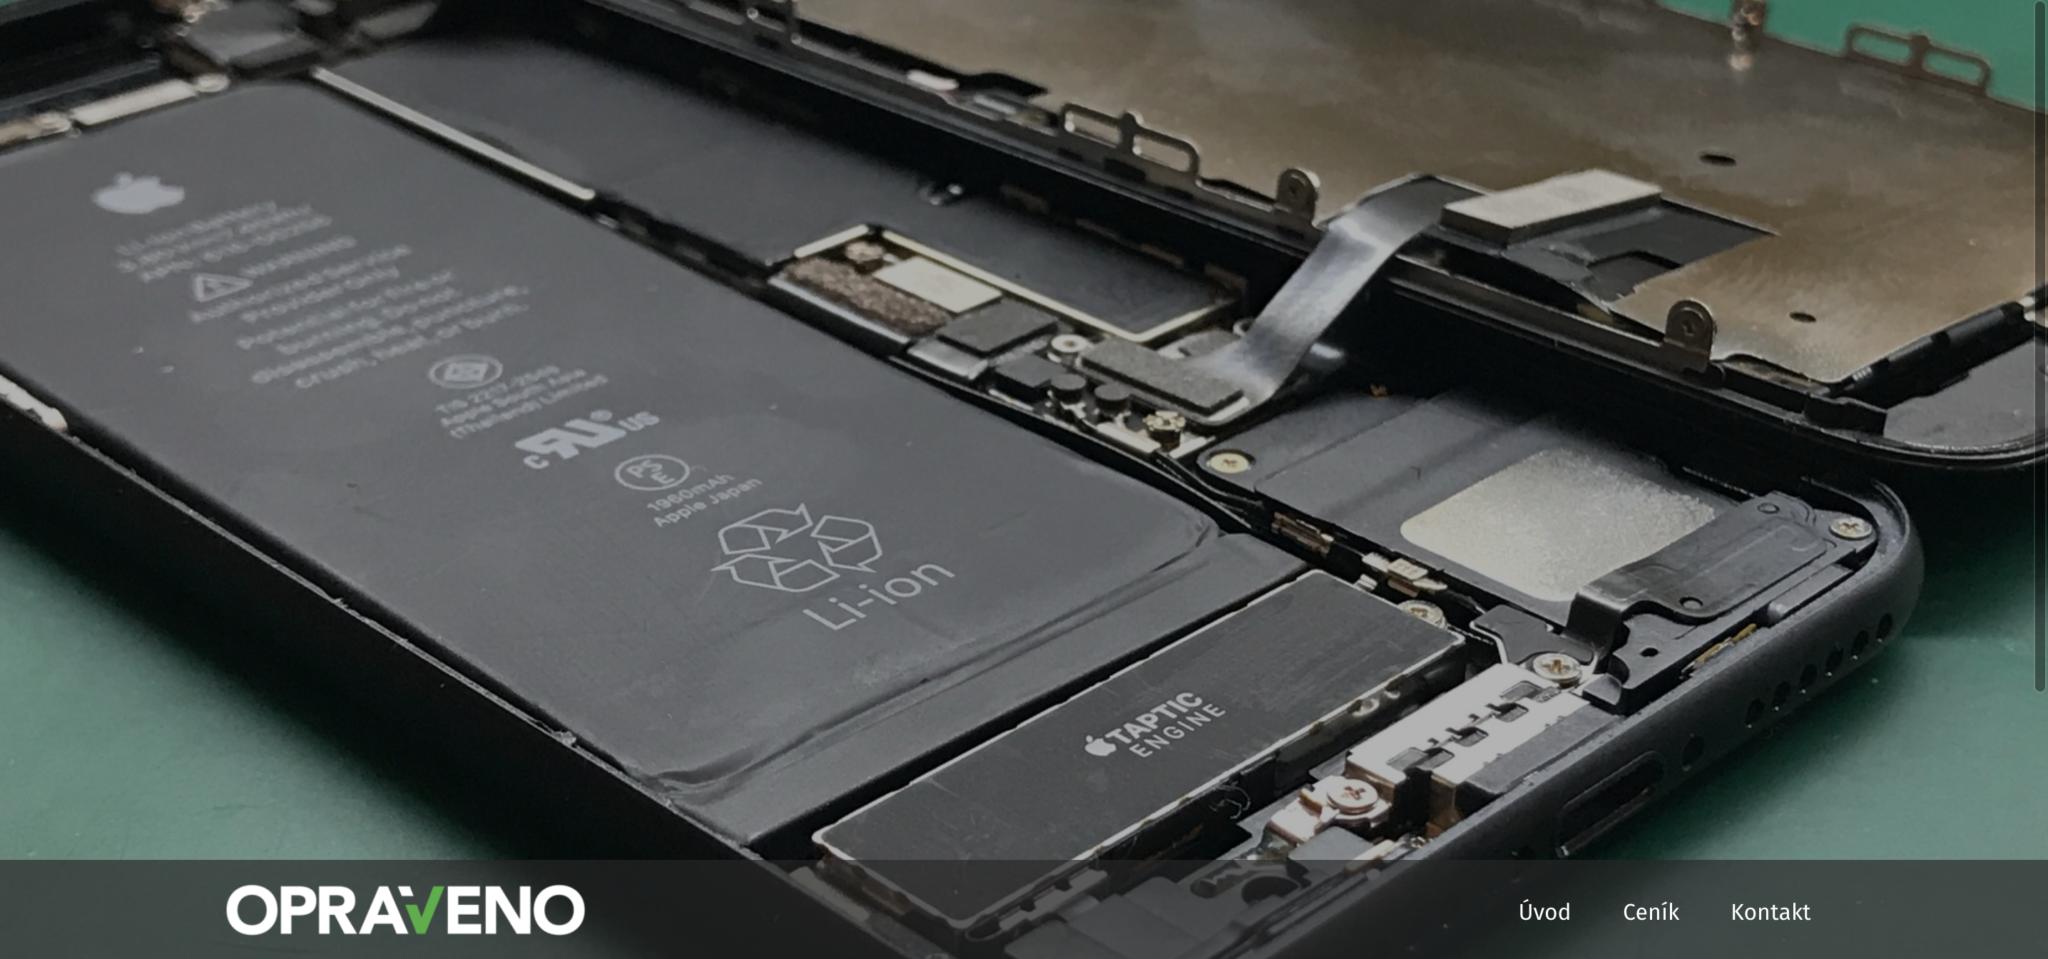 Rozbitý iPhone po záruce? Doporučujeme navštívit servis Opraveno.com [sponzorovaný článek]